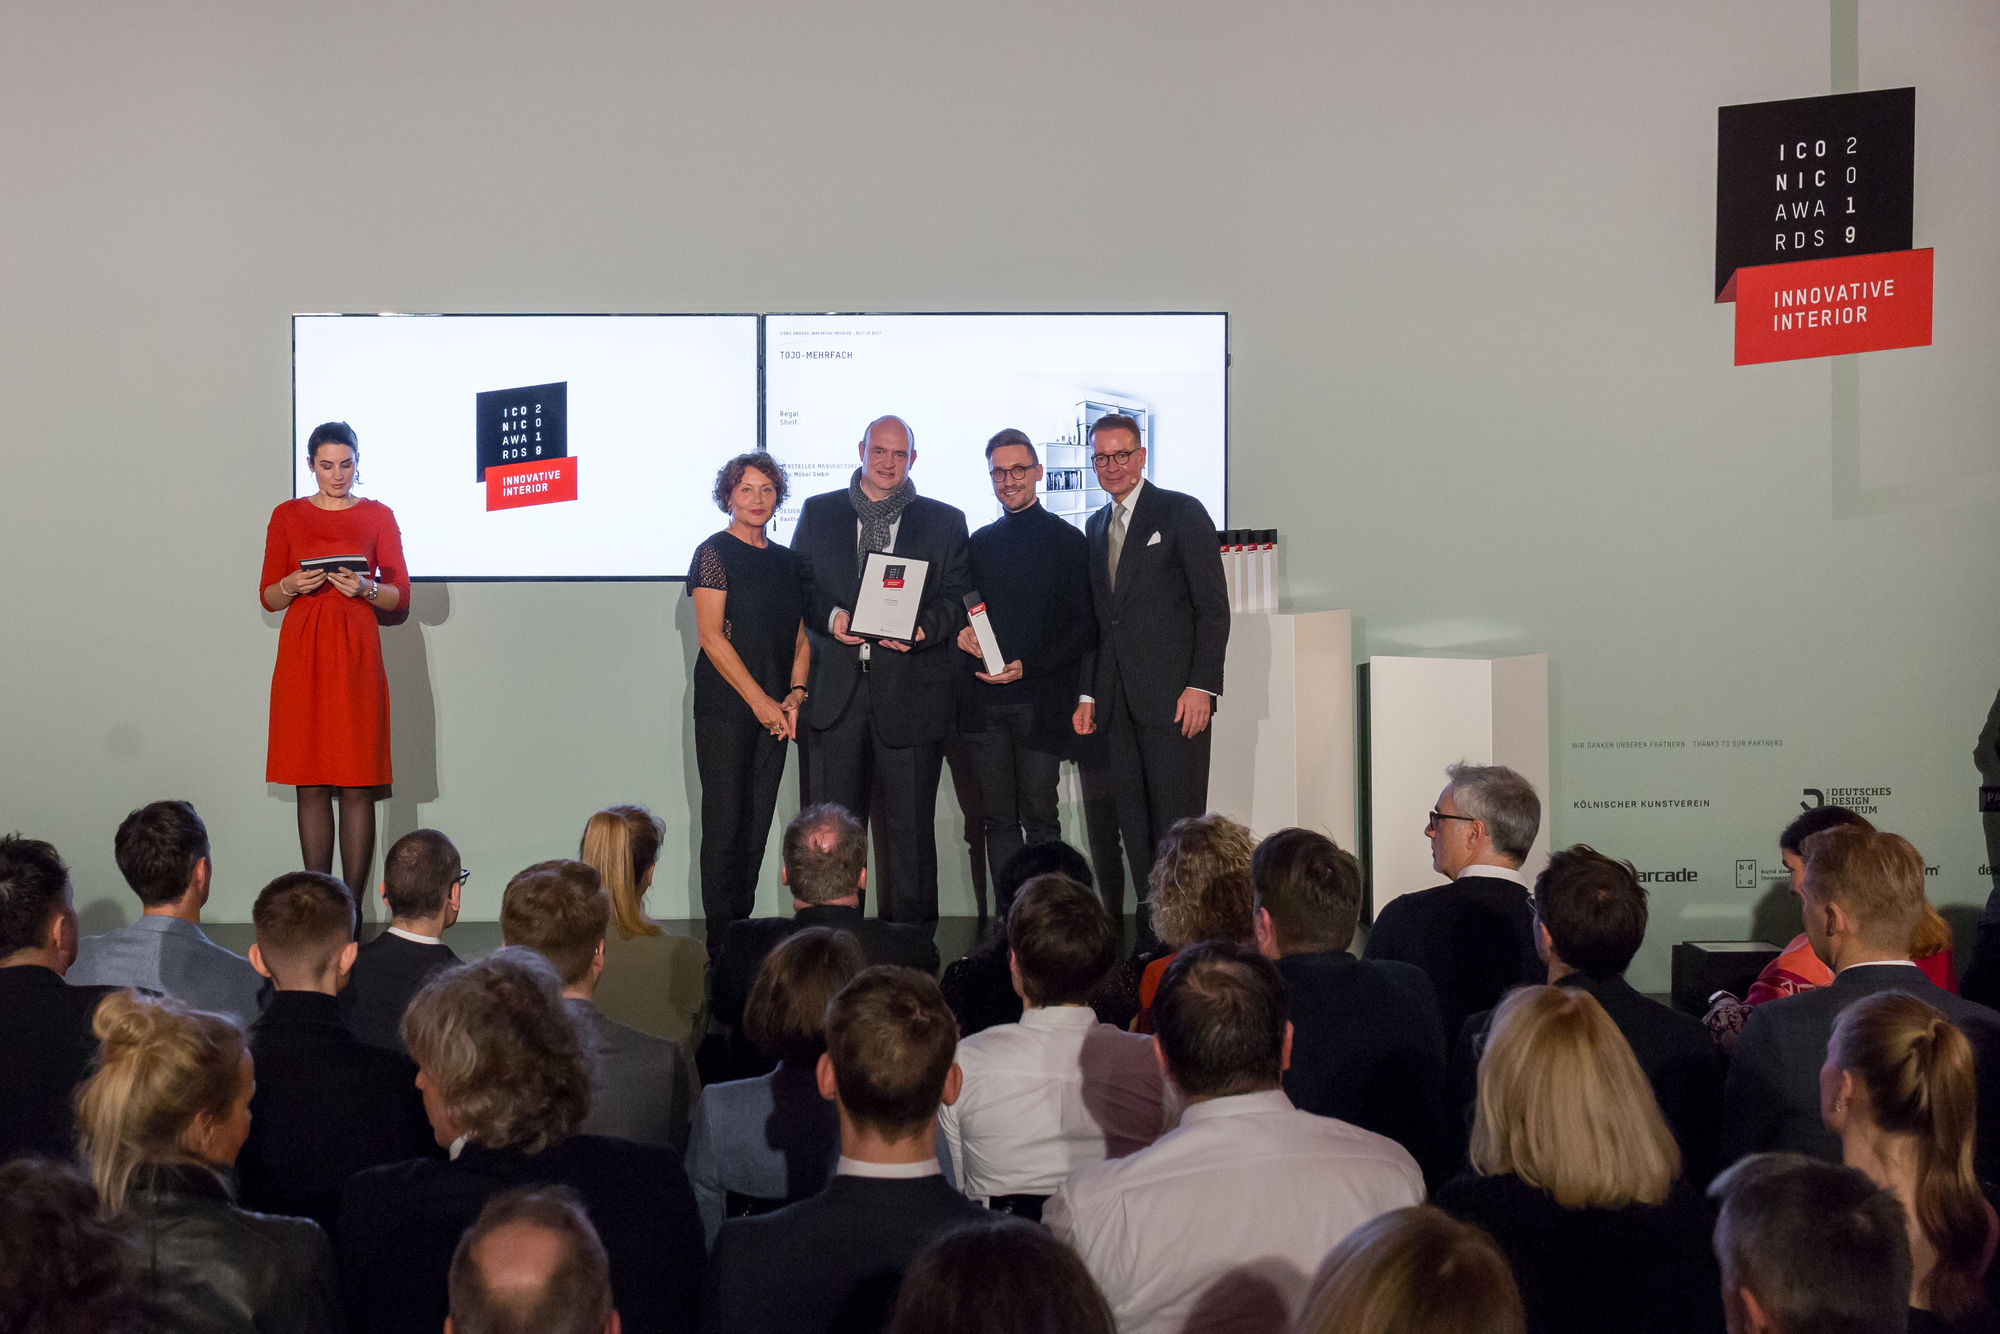 Iconic Award - imm Köln